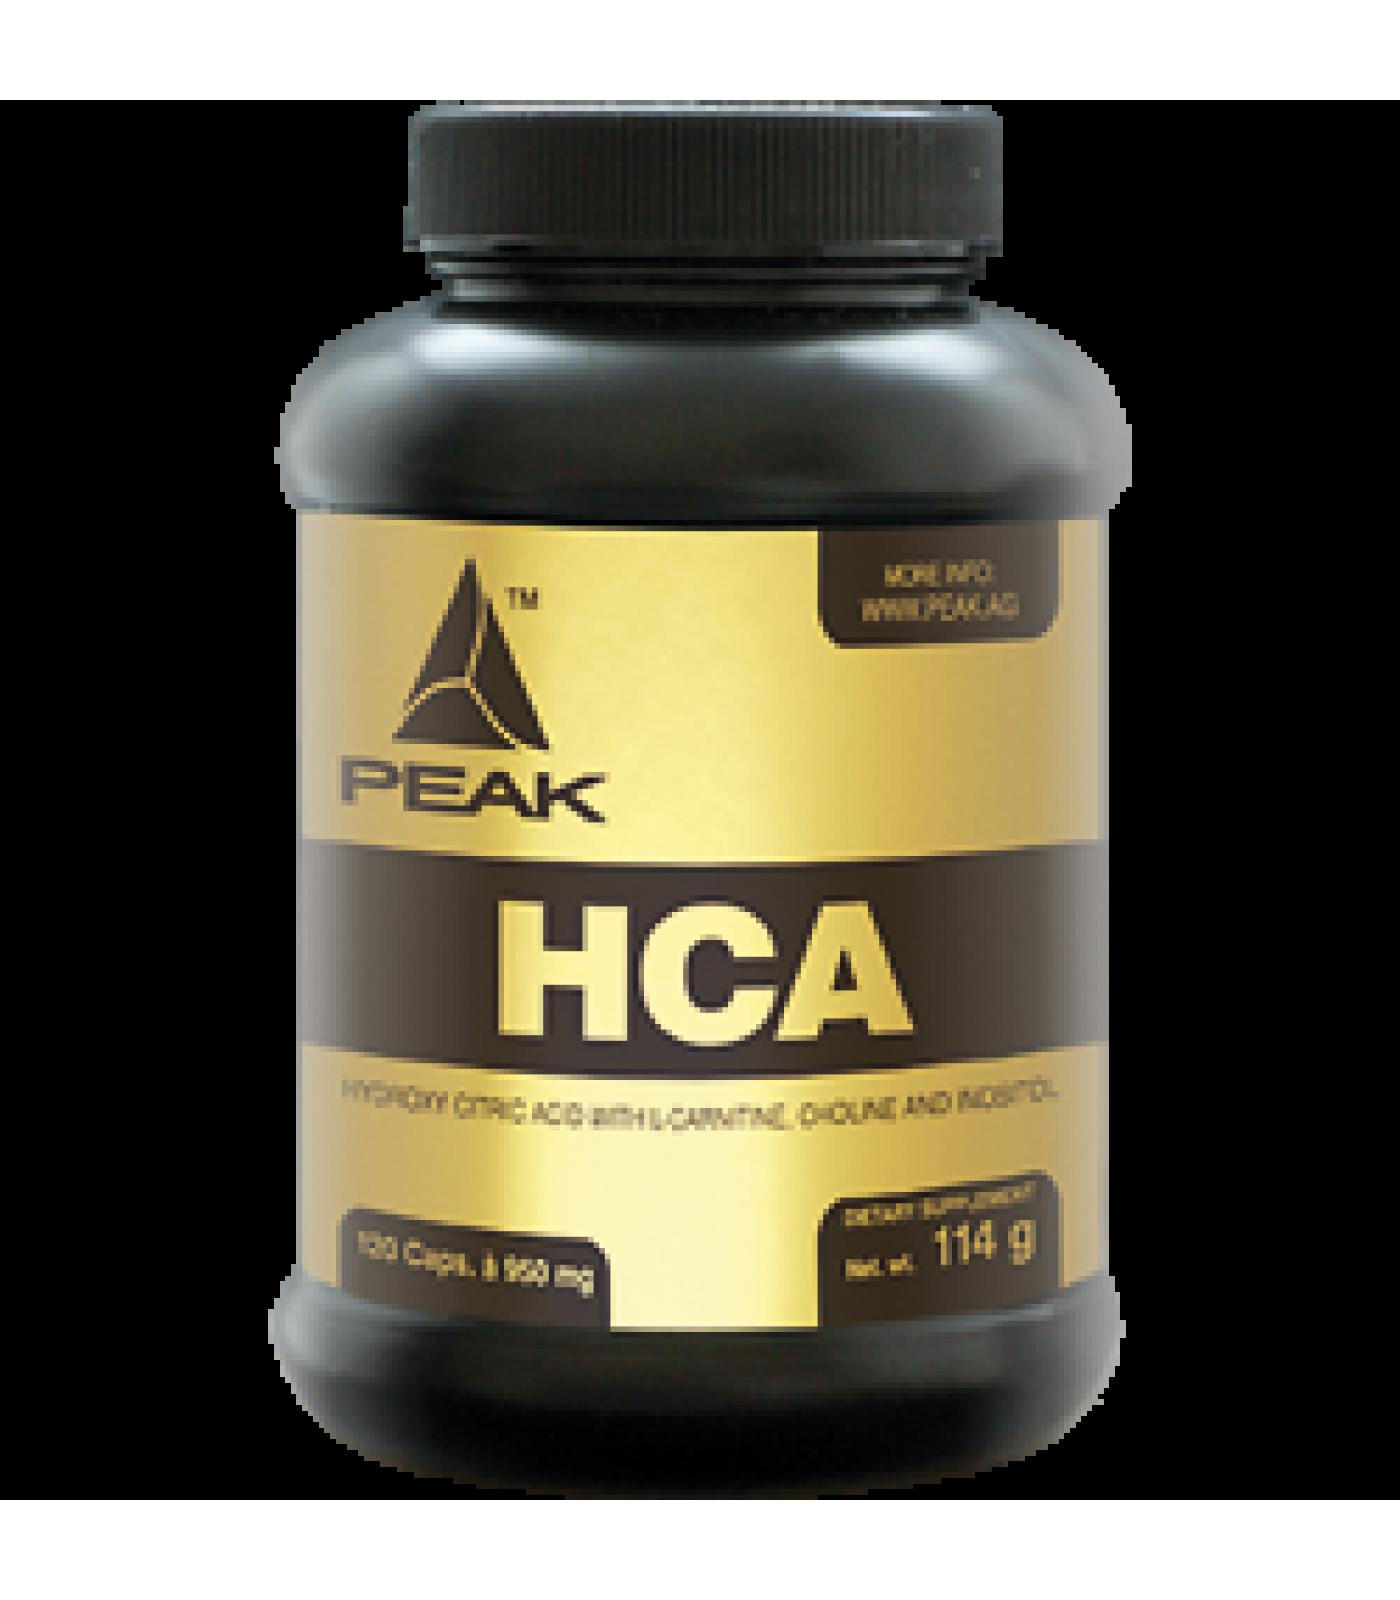 Peak - HCA (Hydroxy-Citric-Acide) / 120 caps